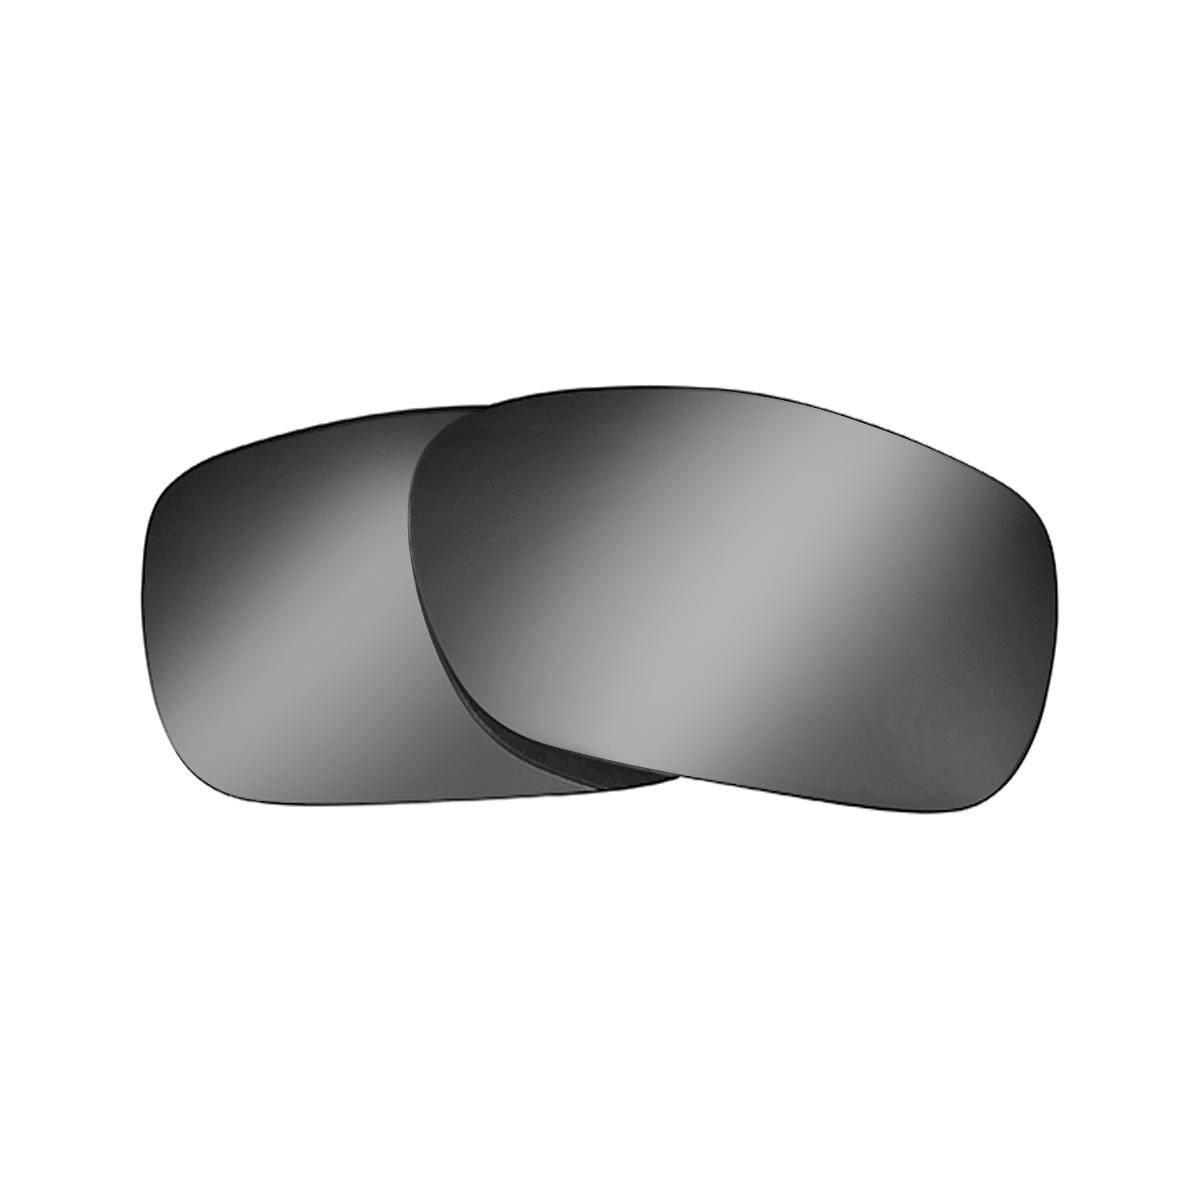 60eccff462b TWOFACE Replacement Lenses Polarized Black Iridium by SEEK fits OAKLEY